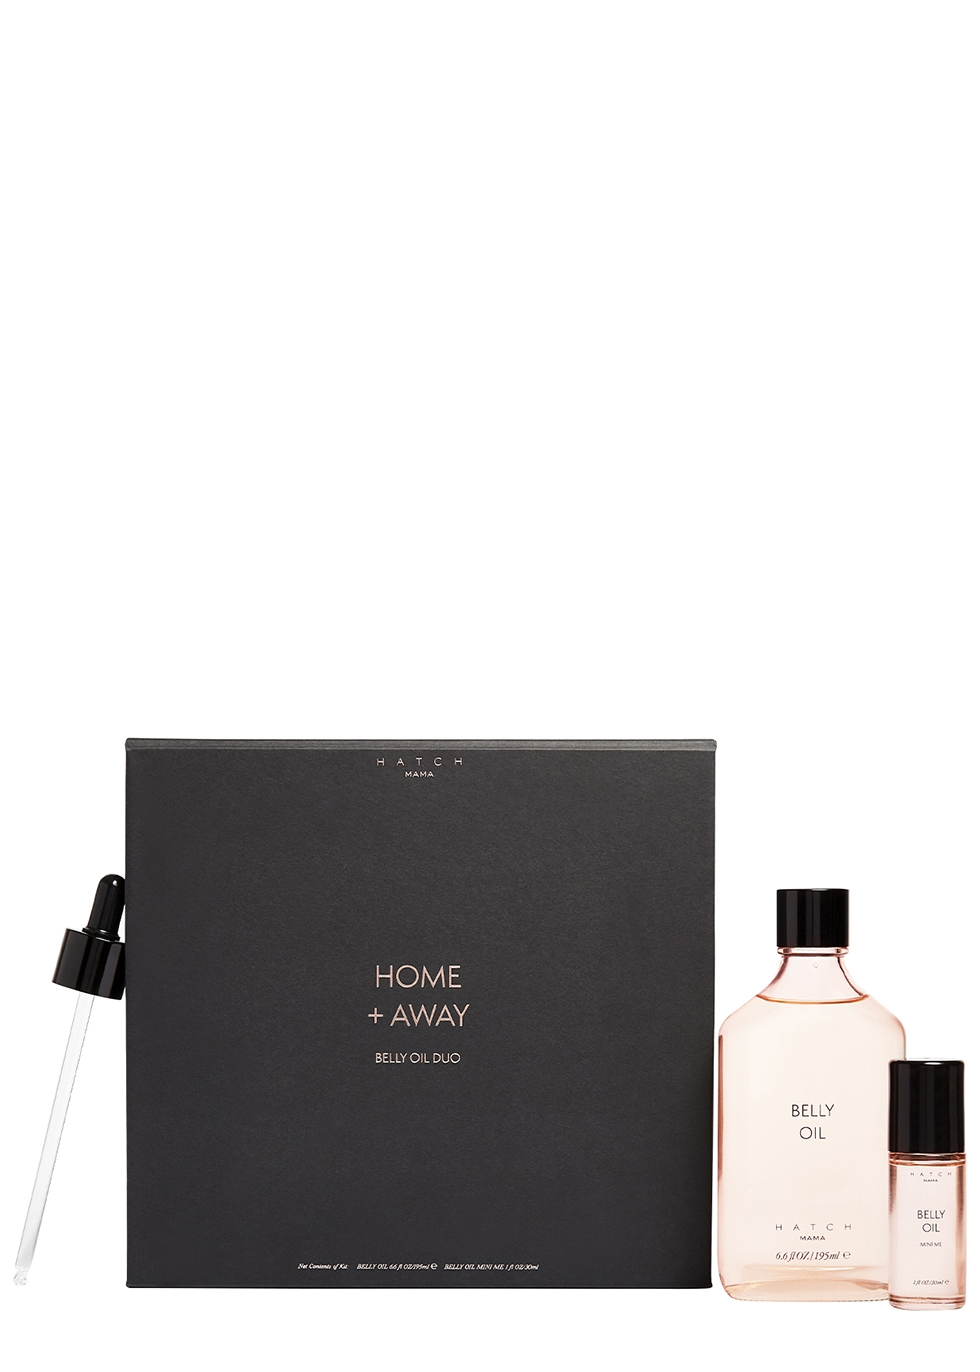 Home + Away Kit